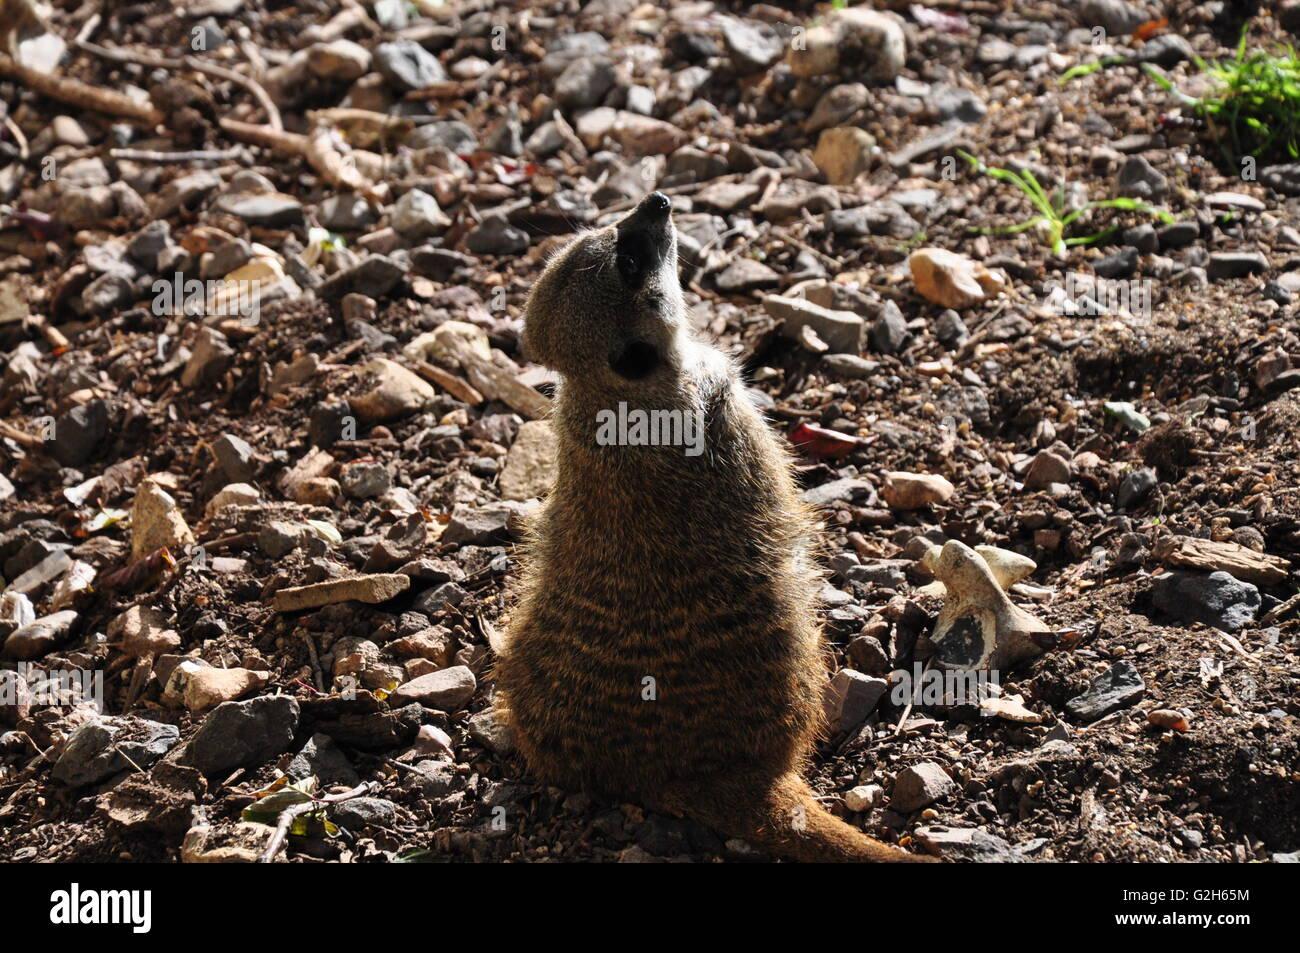 Meerkat in the sun. Stock Photo